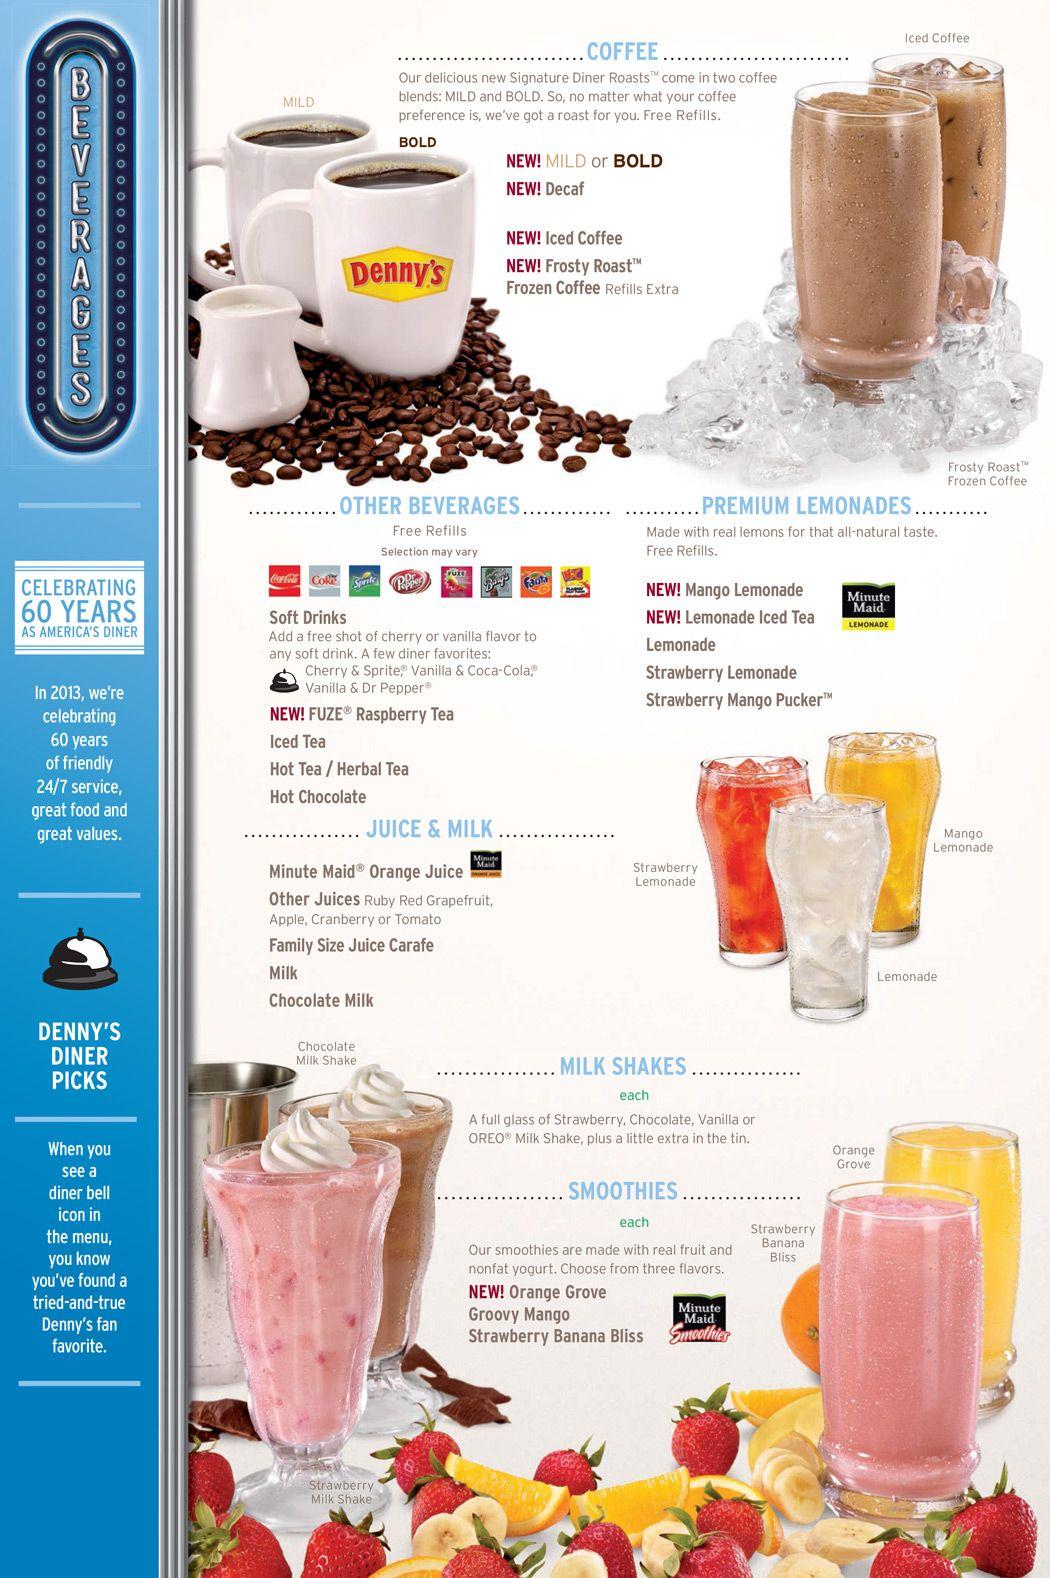 Dennys-menu-2 | Denny\'s | Pinterest | Menu, Refreshing drinks and Food